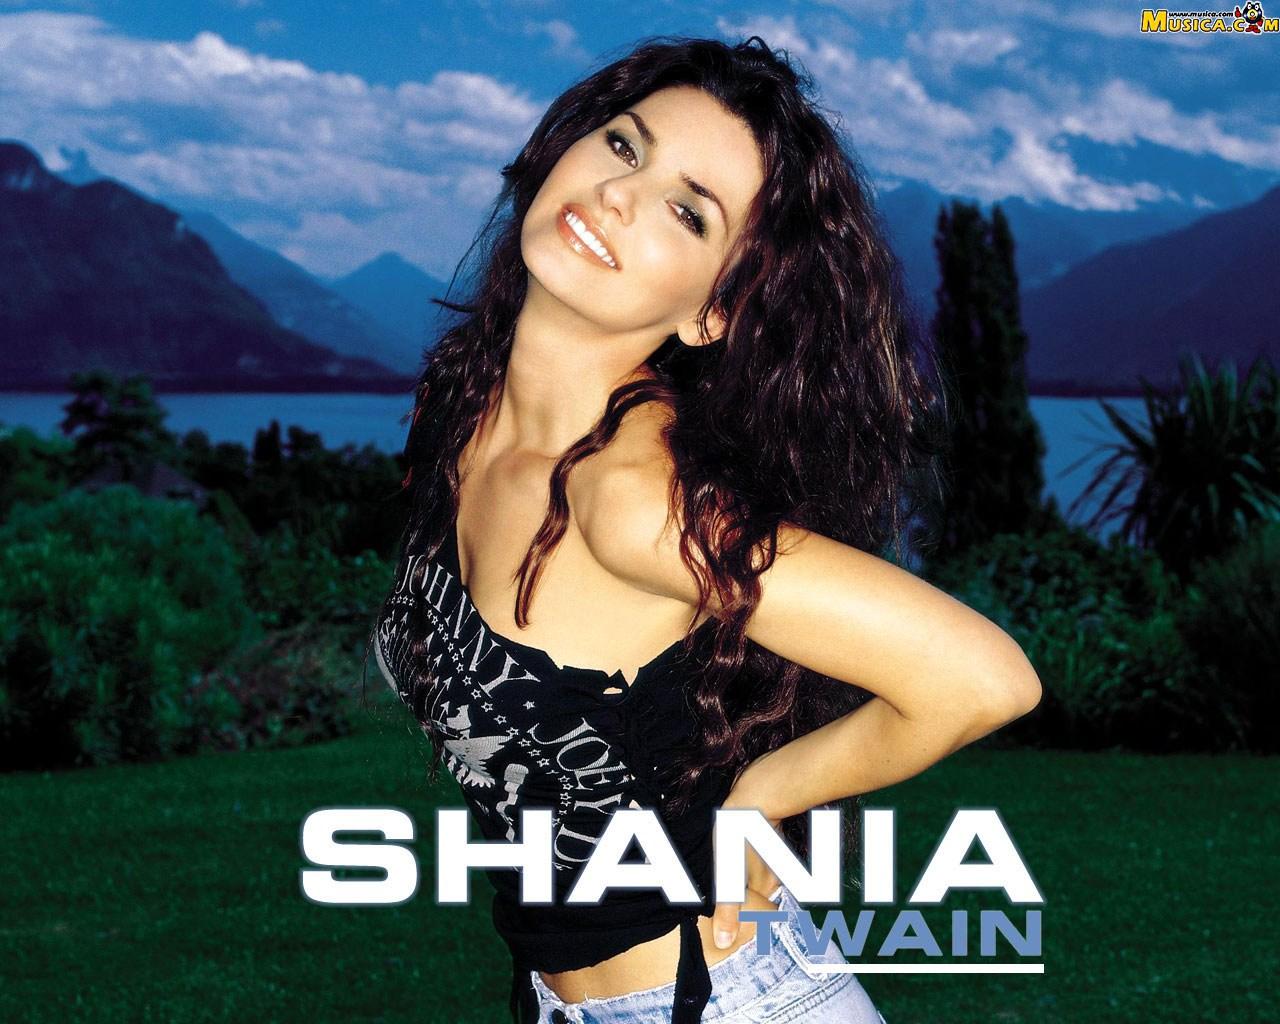 Fondo de pantalla de Shania Twain